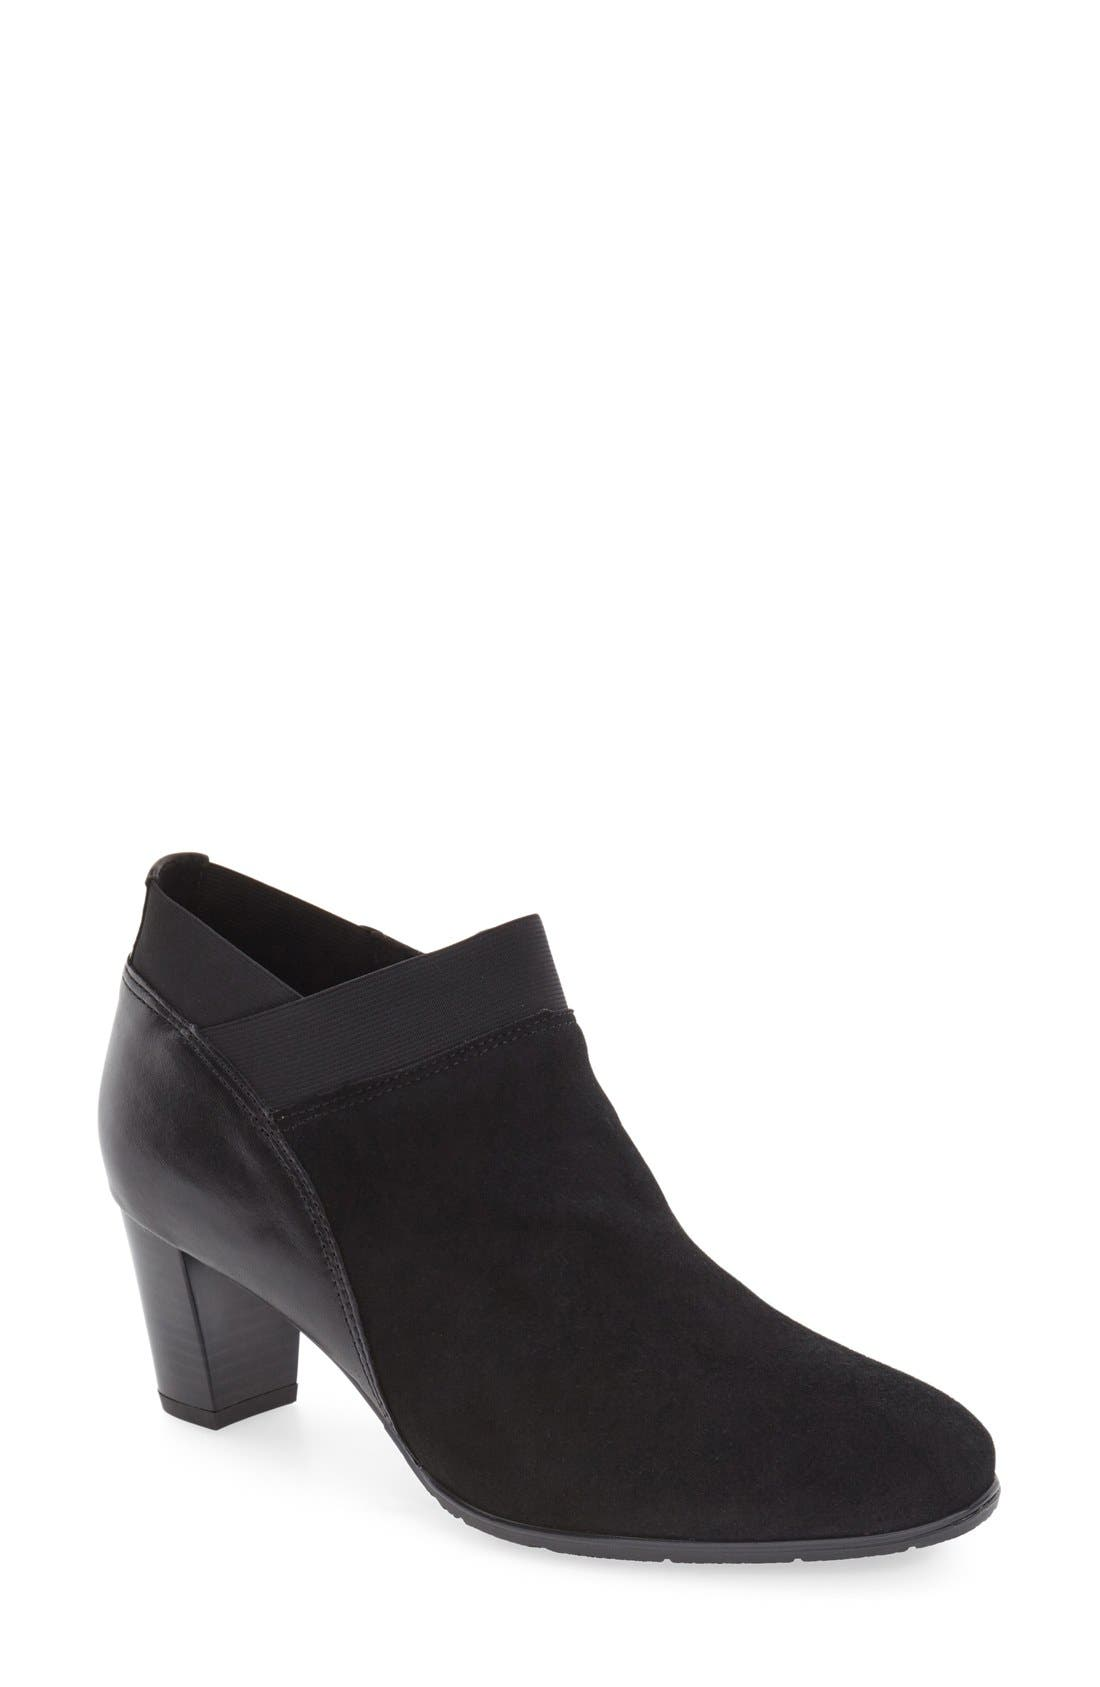 'Torrence' Almond Toe Zip Bootie,                         Main,                         color, BLACK SUEDE